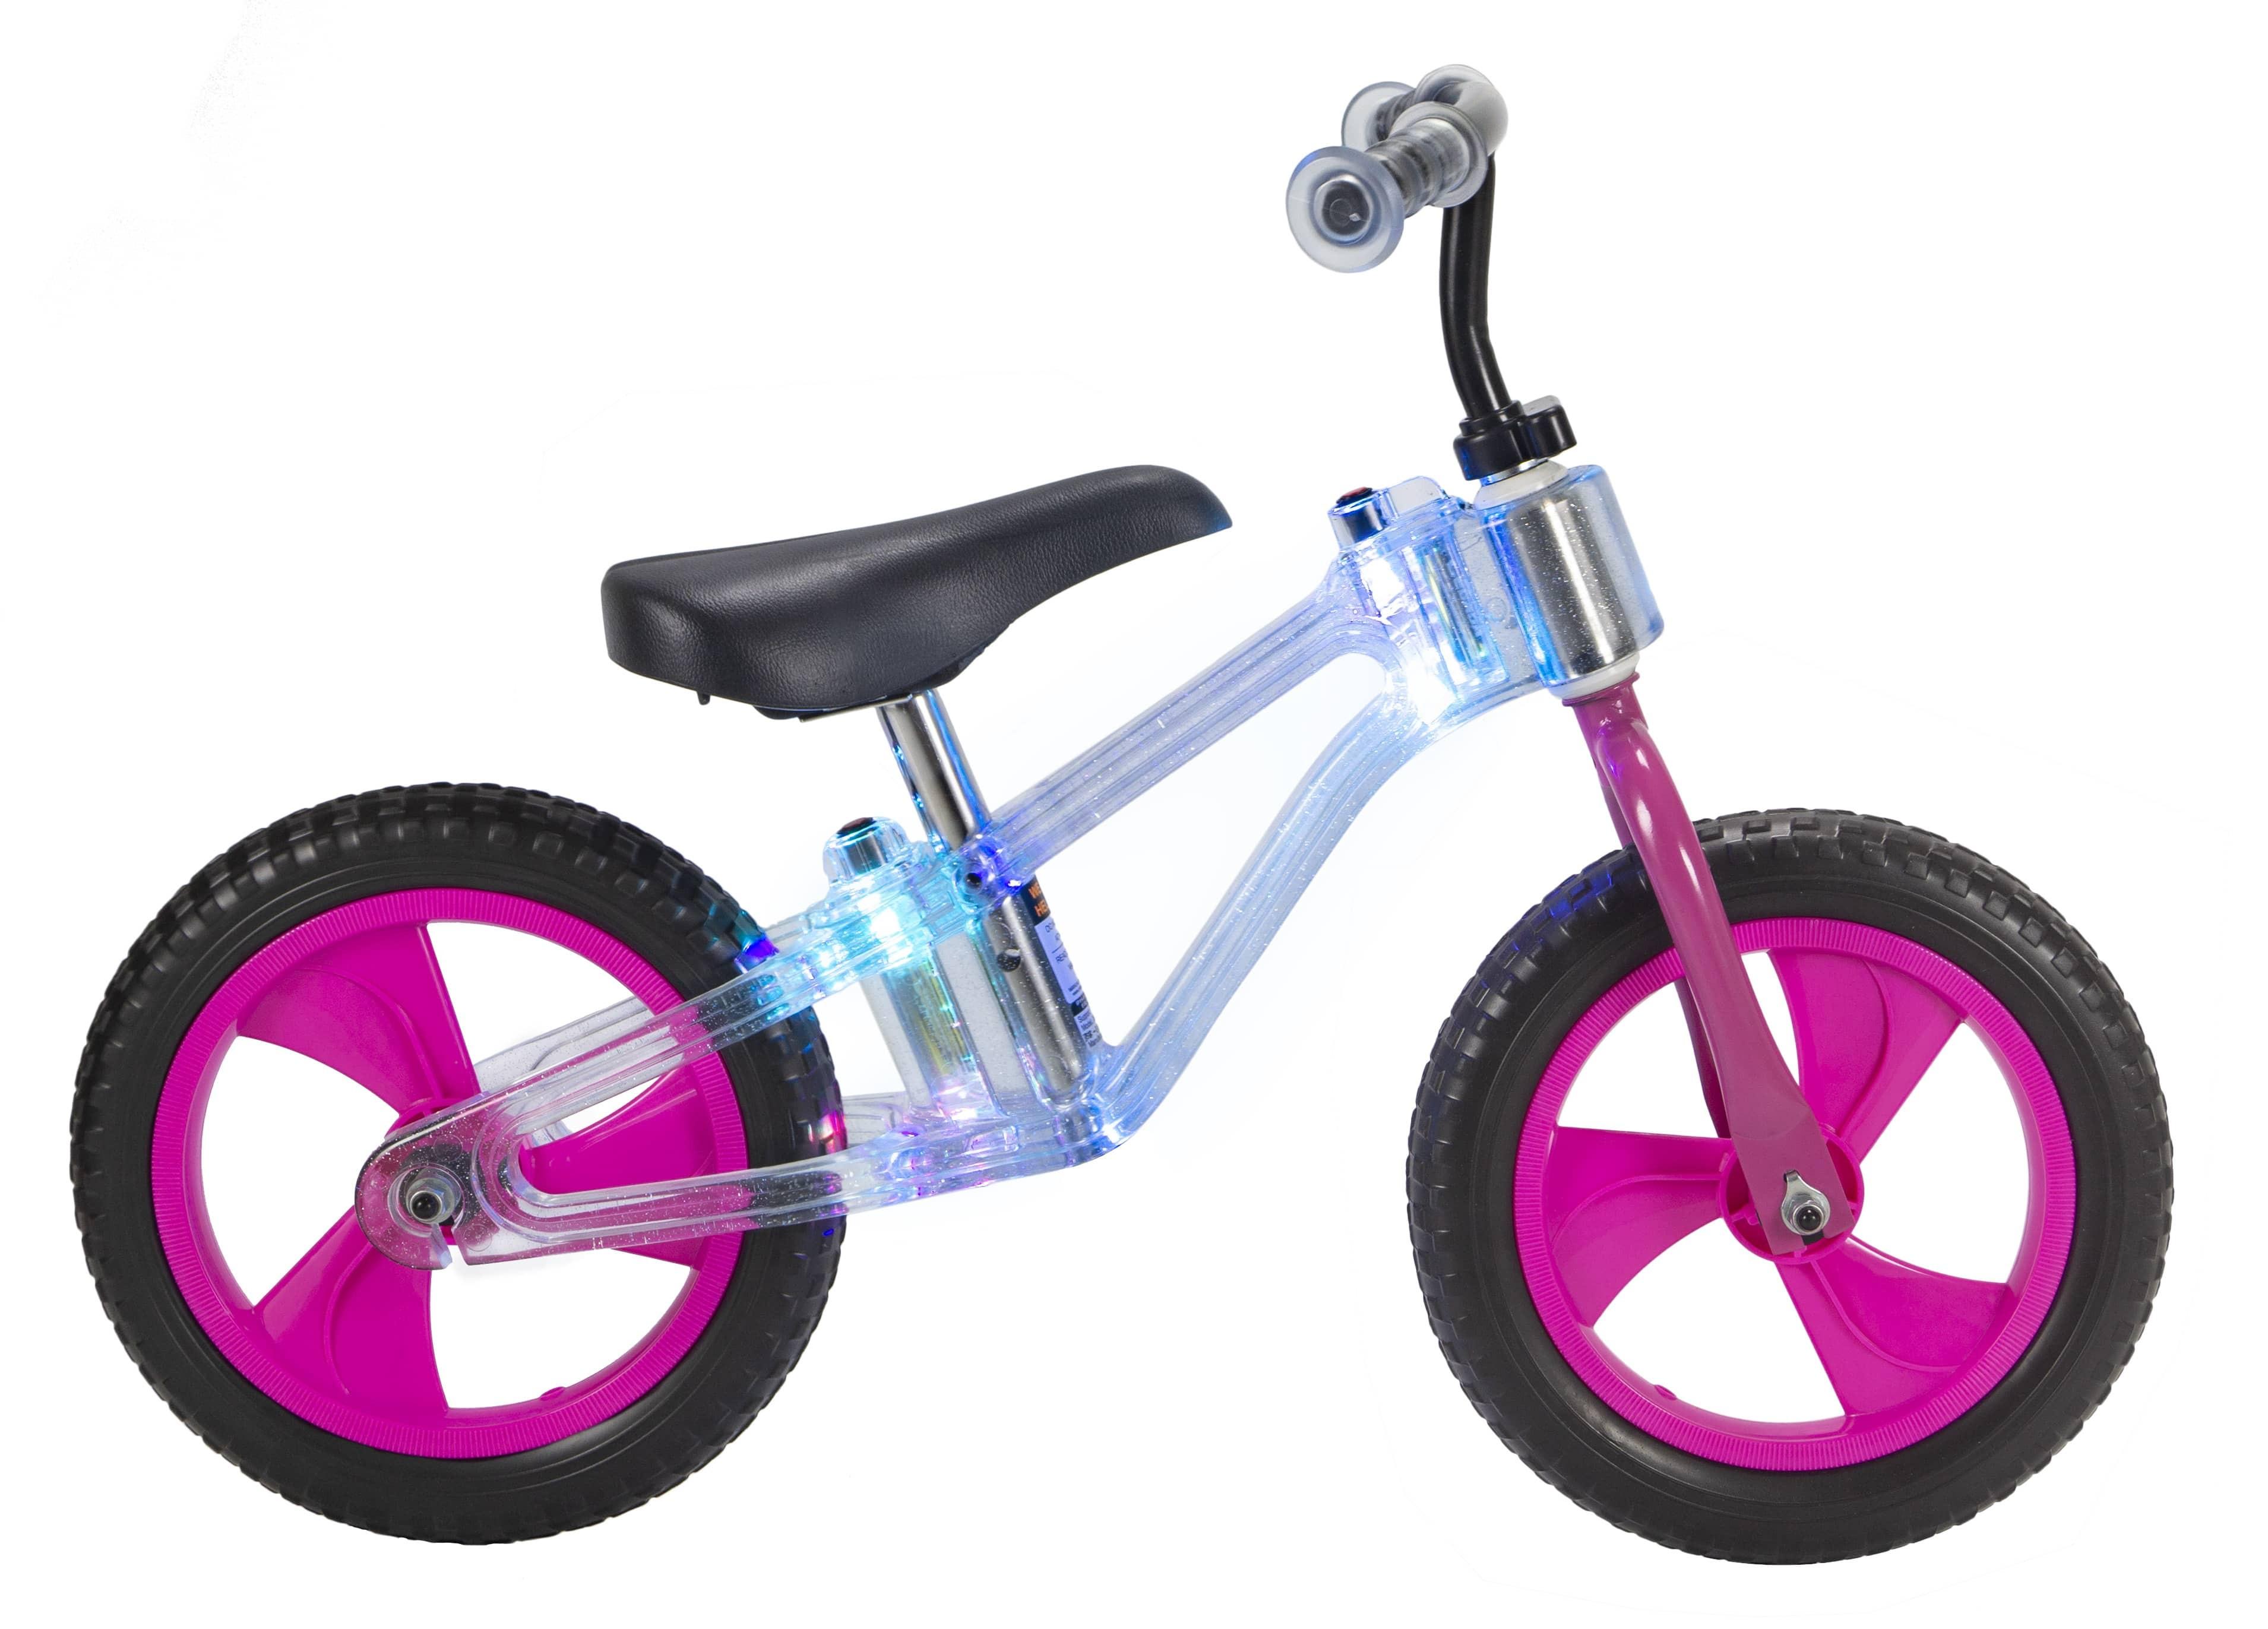 Bicicletta Senza Pedali a Led